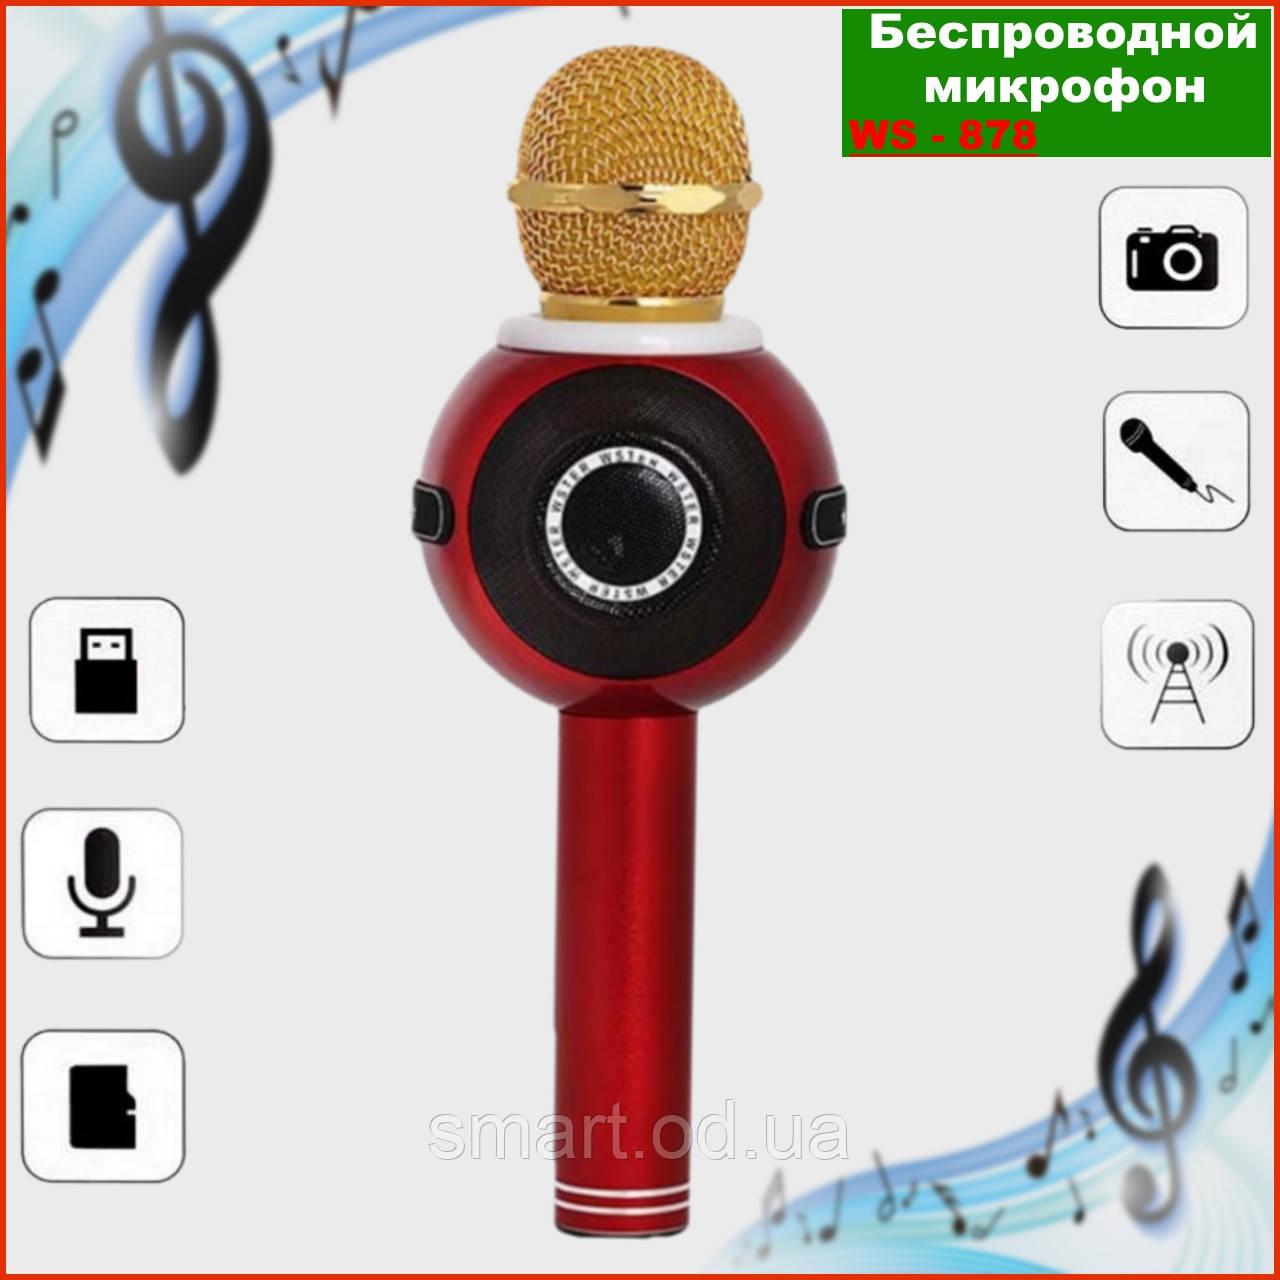 Колонка с функцией Караоке Микрофона Wster WS-878 (USB, microSD, AUX, FM, Bluetooth)